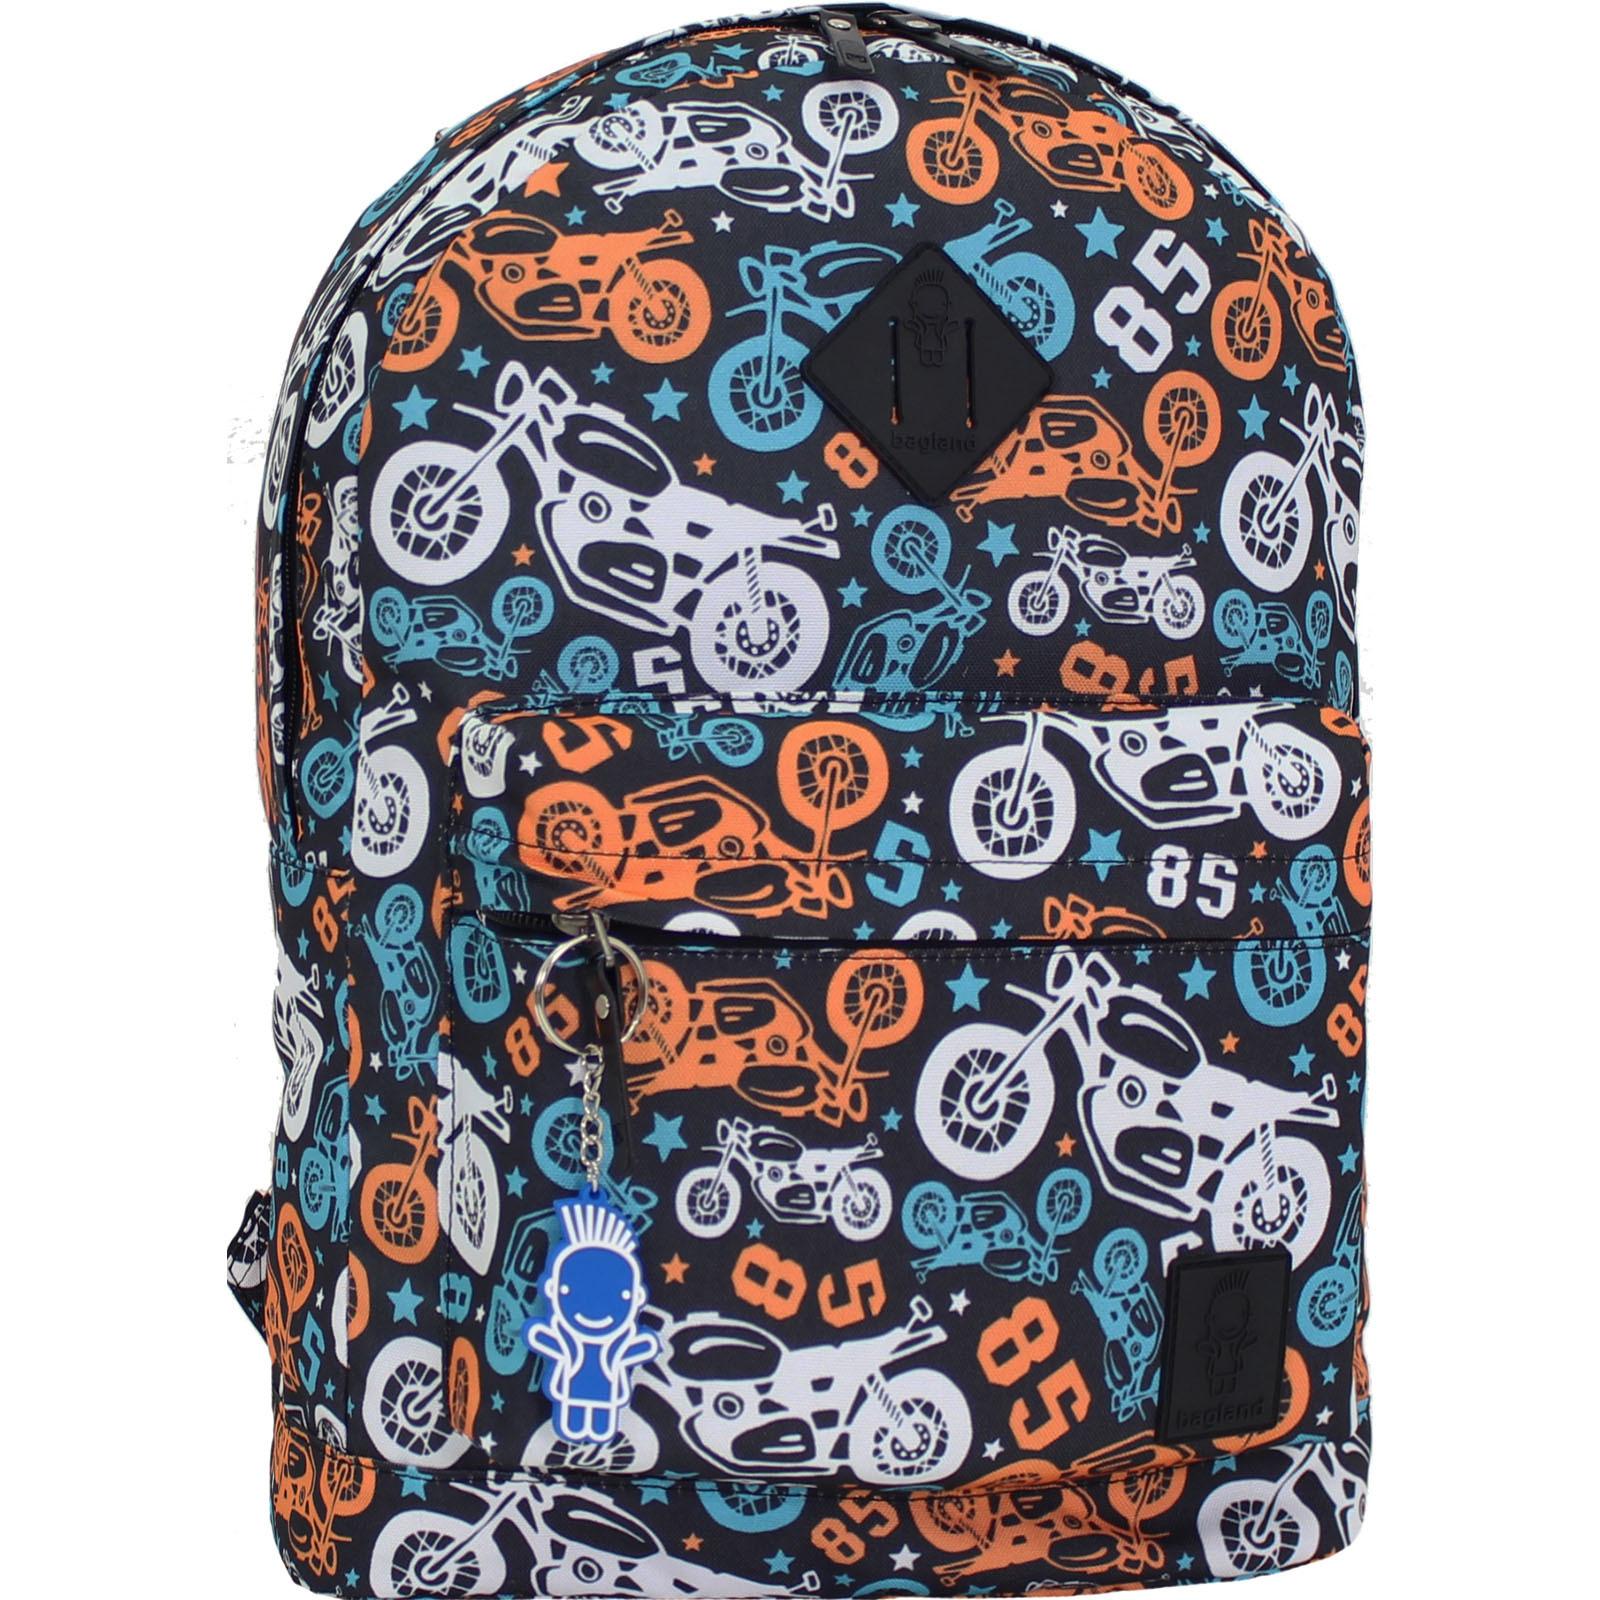 Городские рюкзаки Рюкзак Bagland Молодежный (дизайн) 17 л. сублимация 260 (00533664) IMG_1089_260.JPG